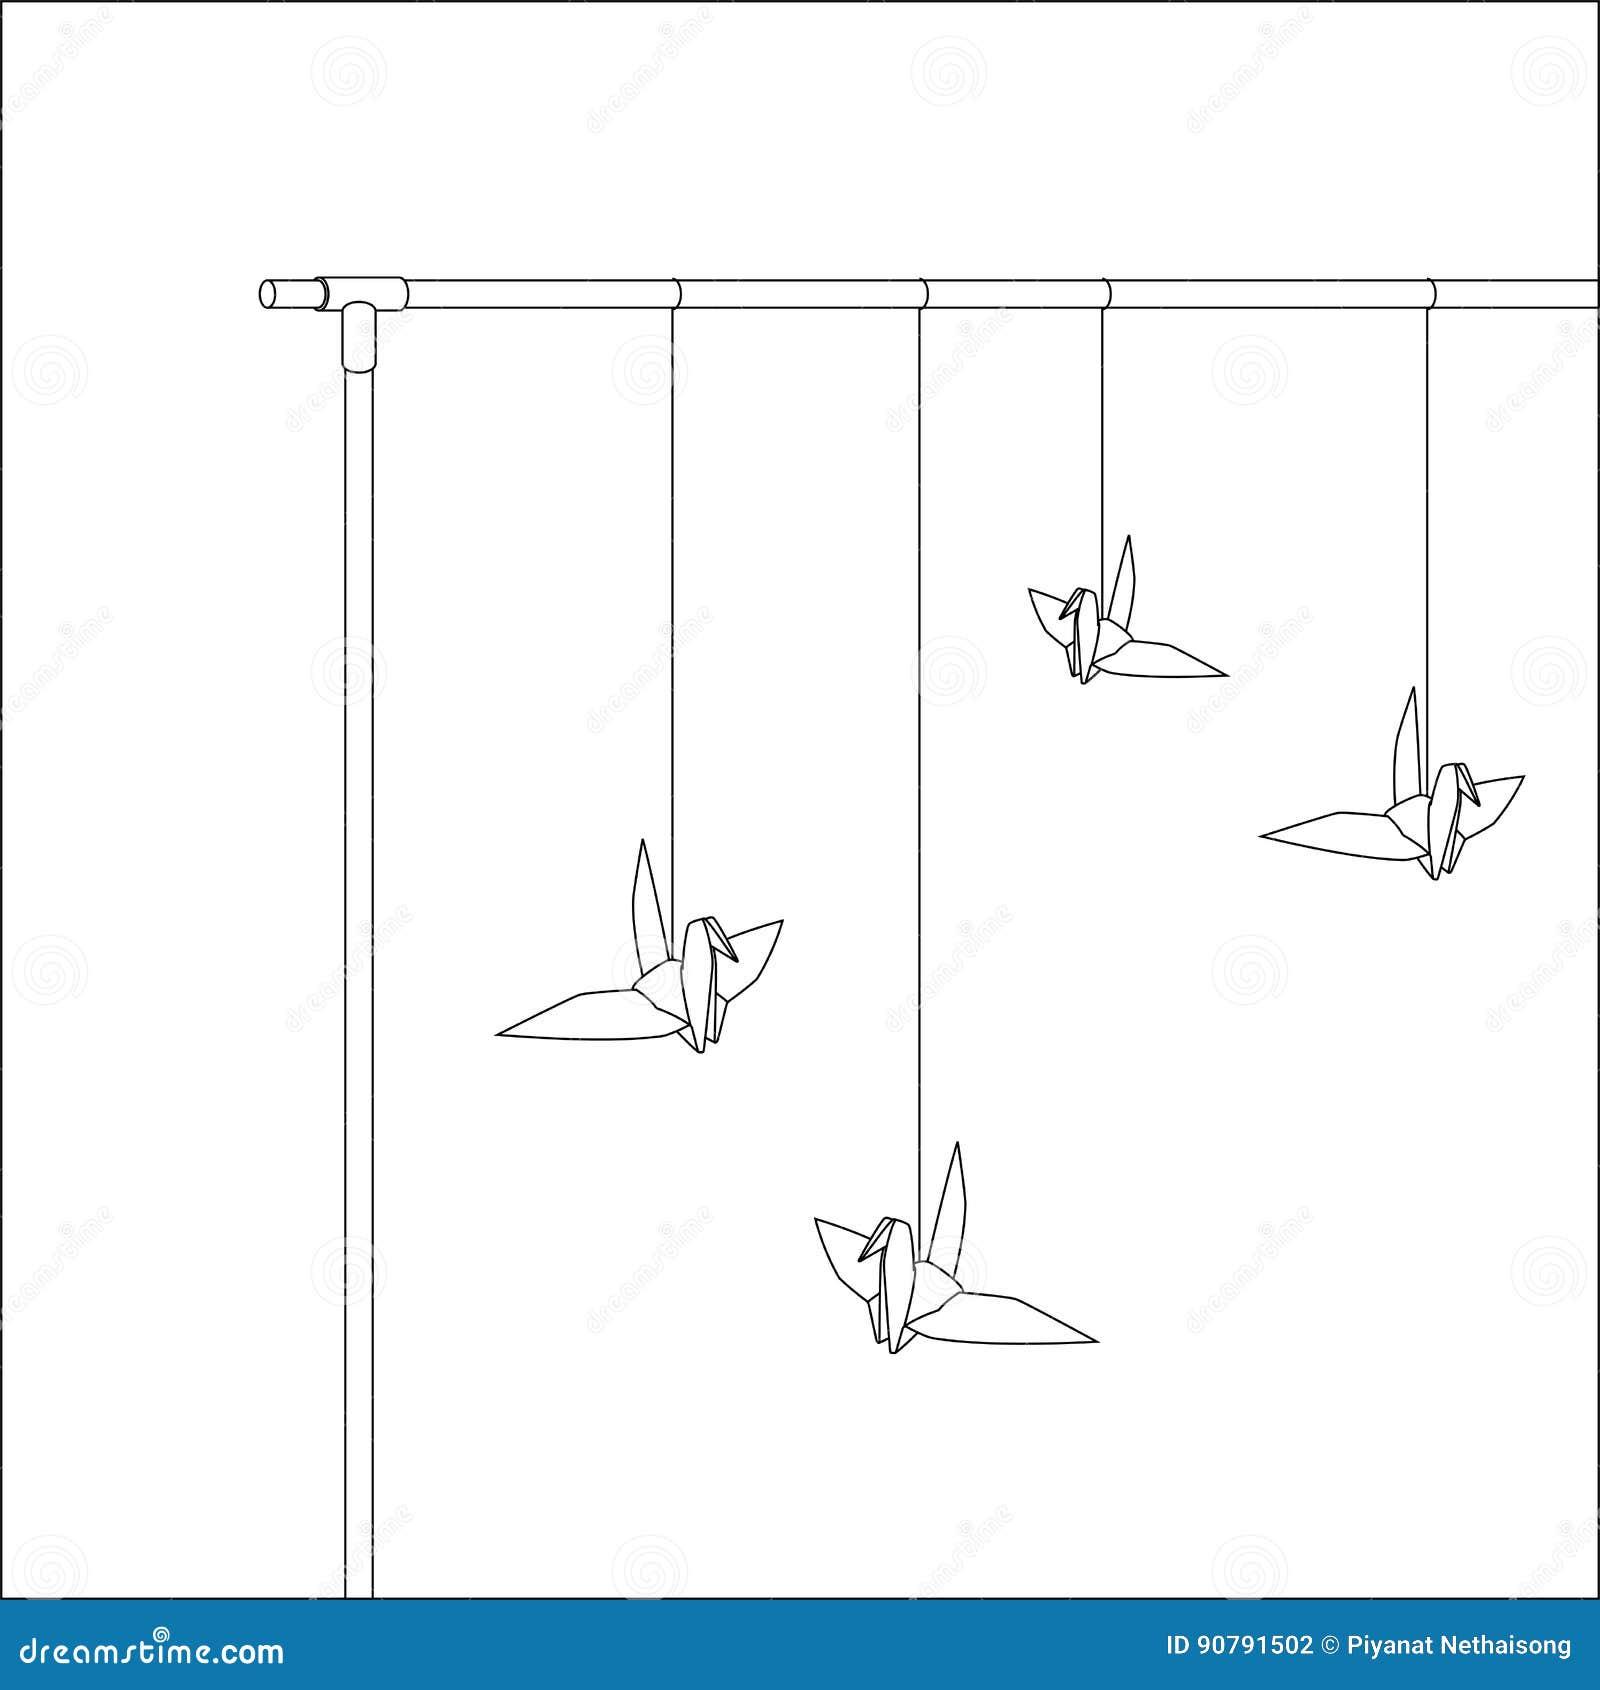 Newtons cartoons illustrations vector stock images for Balancing bird template